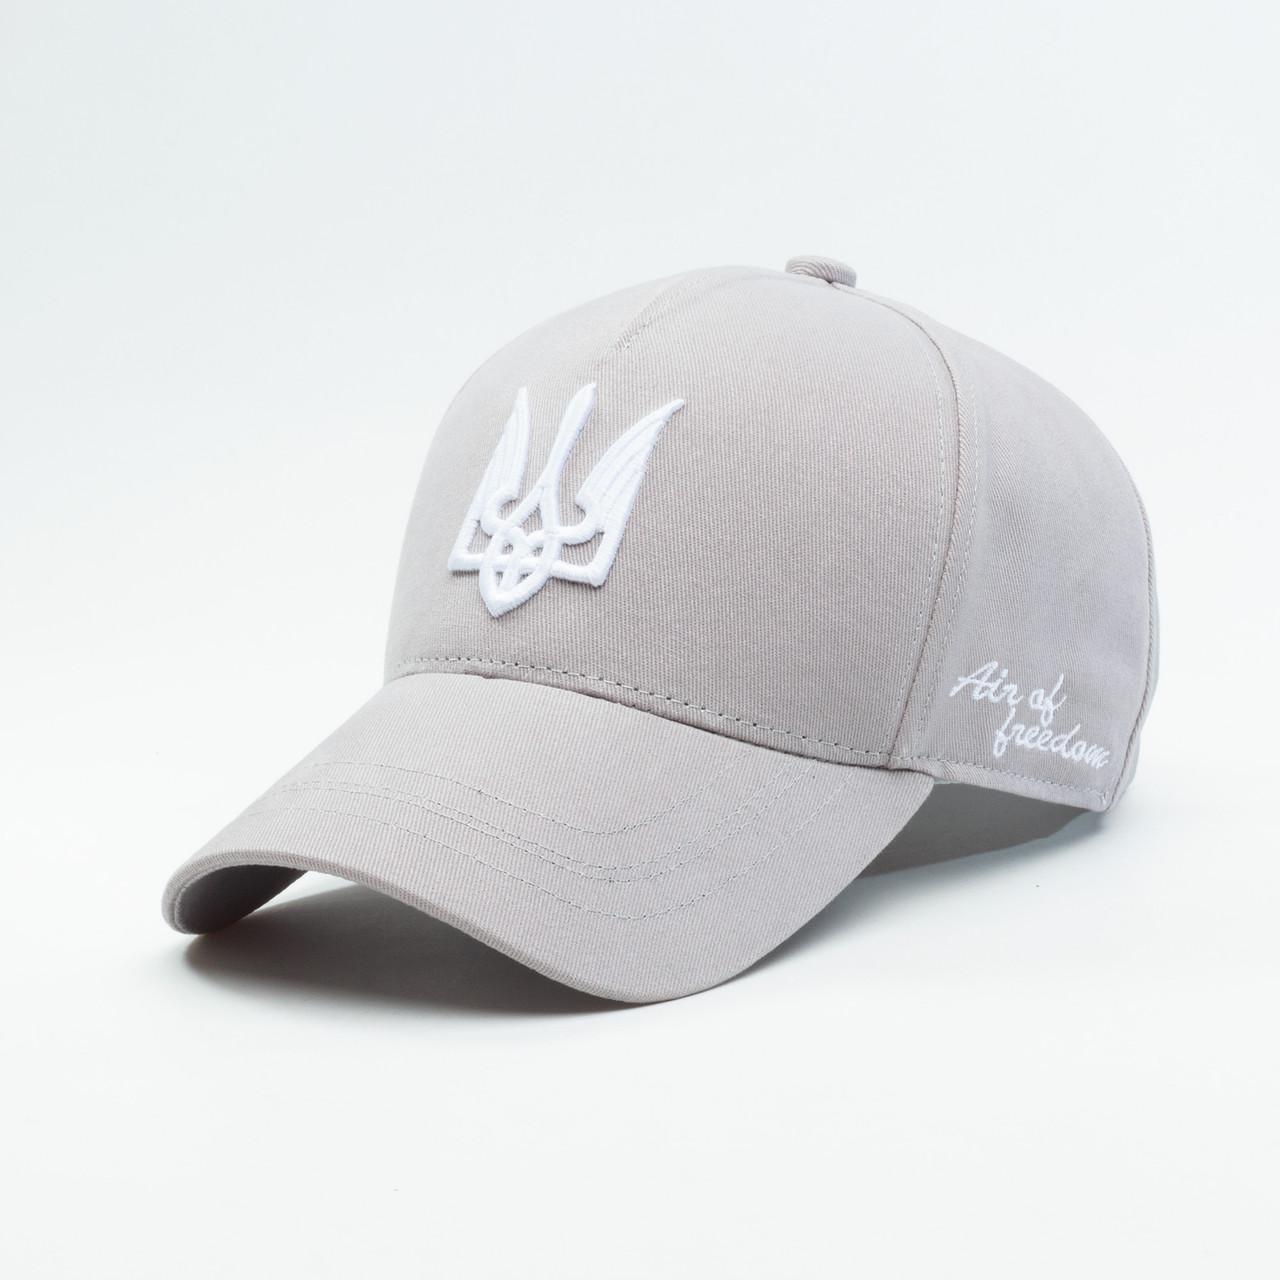 Купить Кепка бейсболка мужская INAL air of freedom S / 53-54 RU Серый 37453